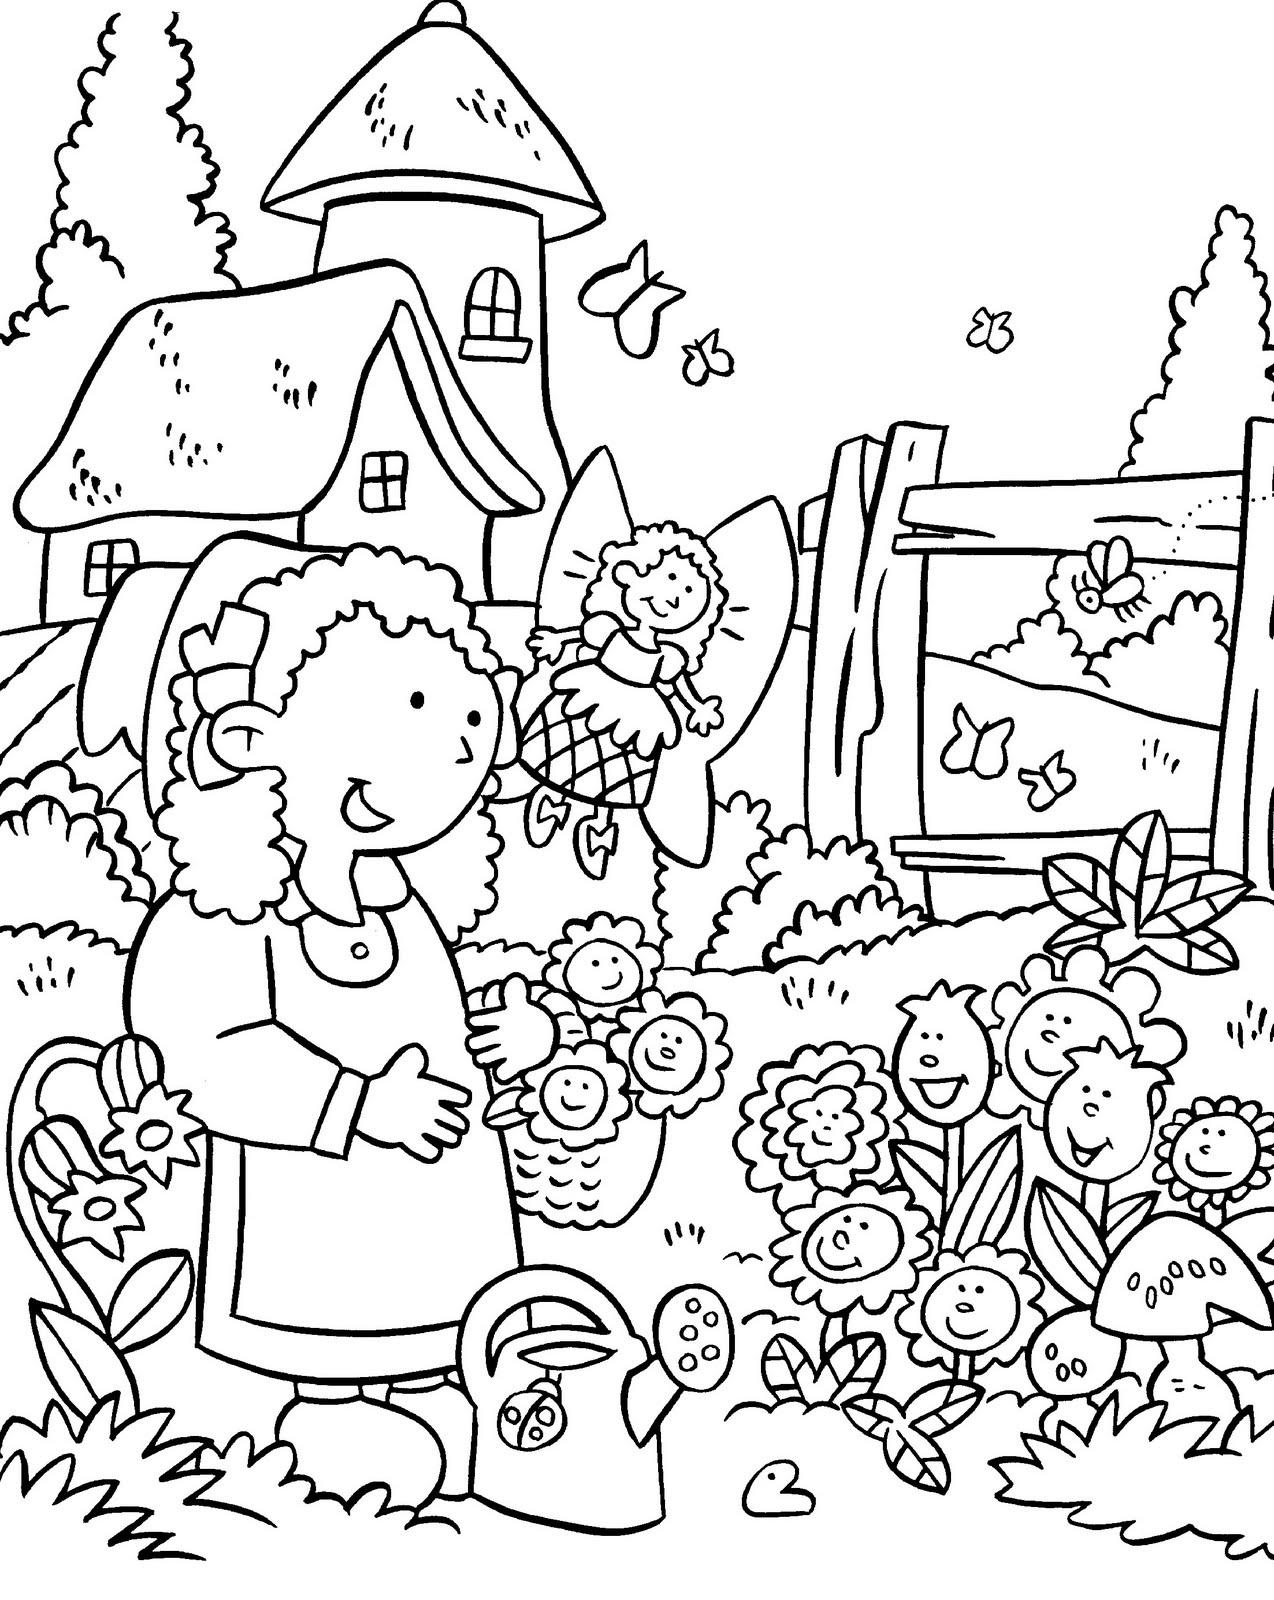 garden coloring sheet inkspired musings it39s hard to be green sheet coloring garden